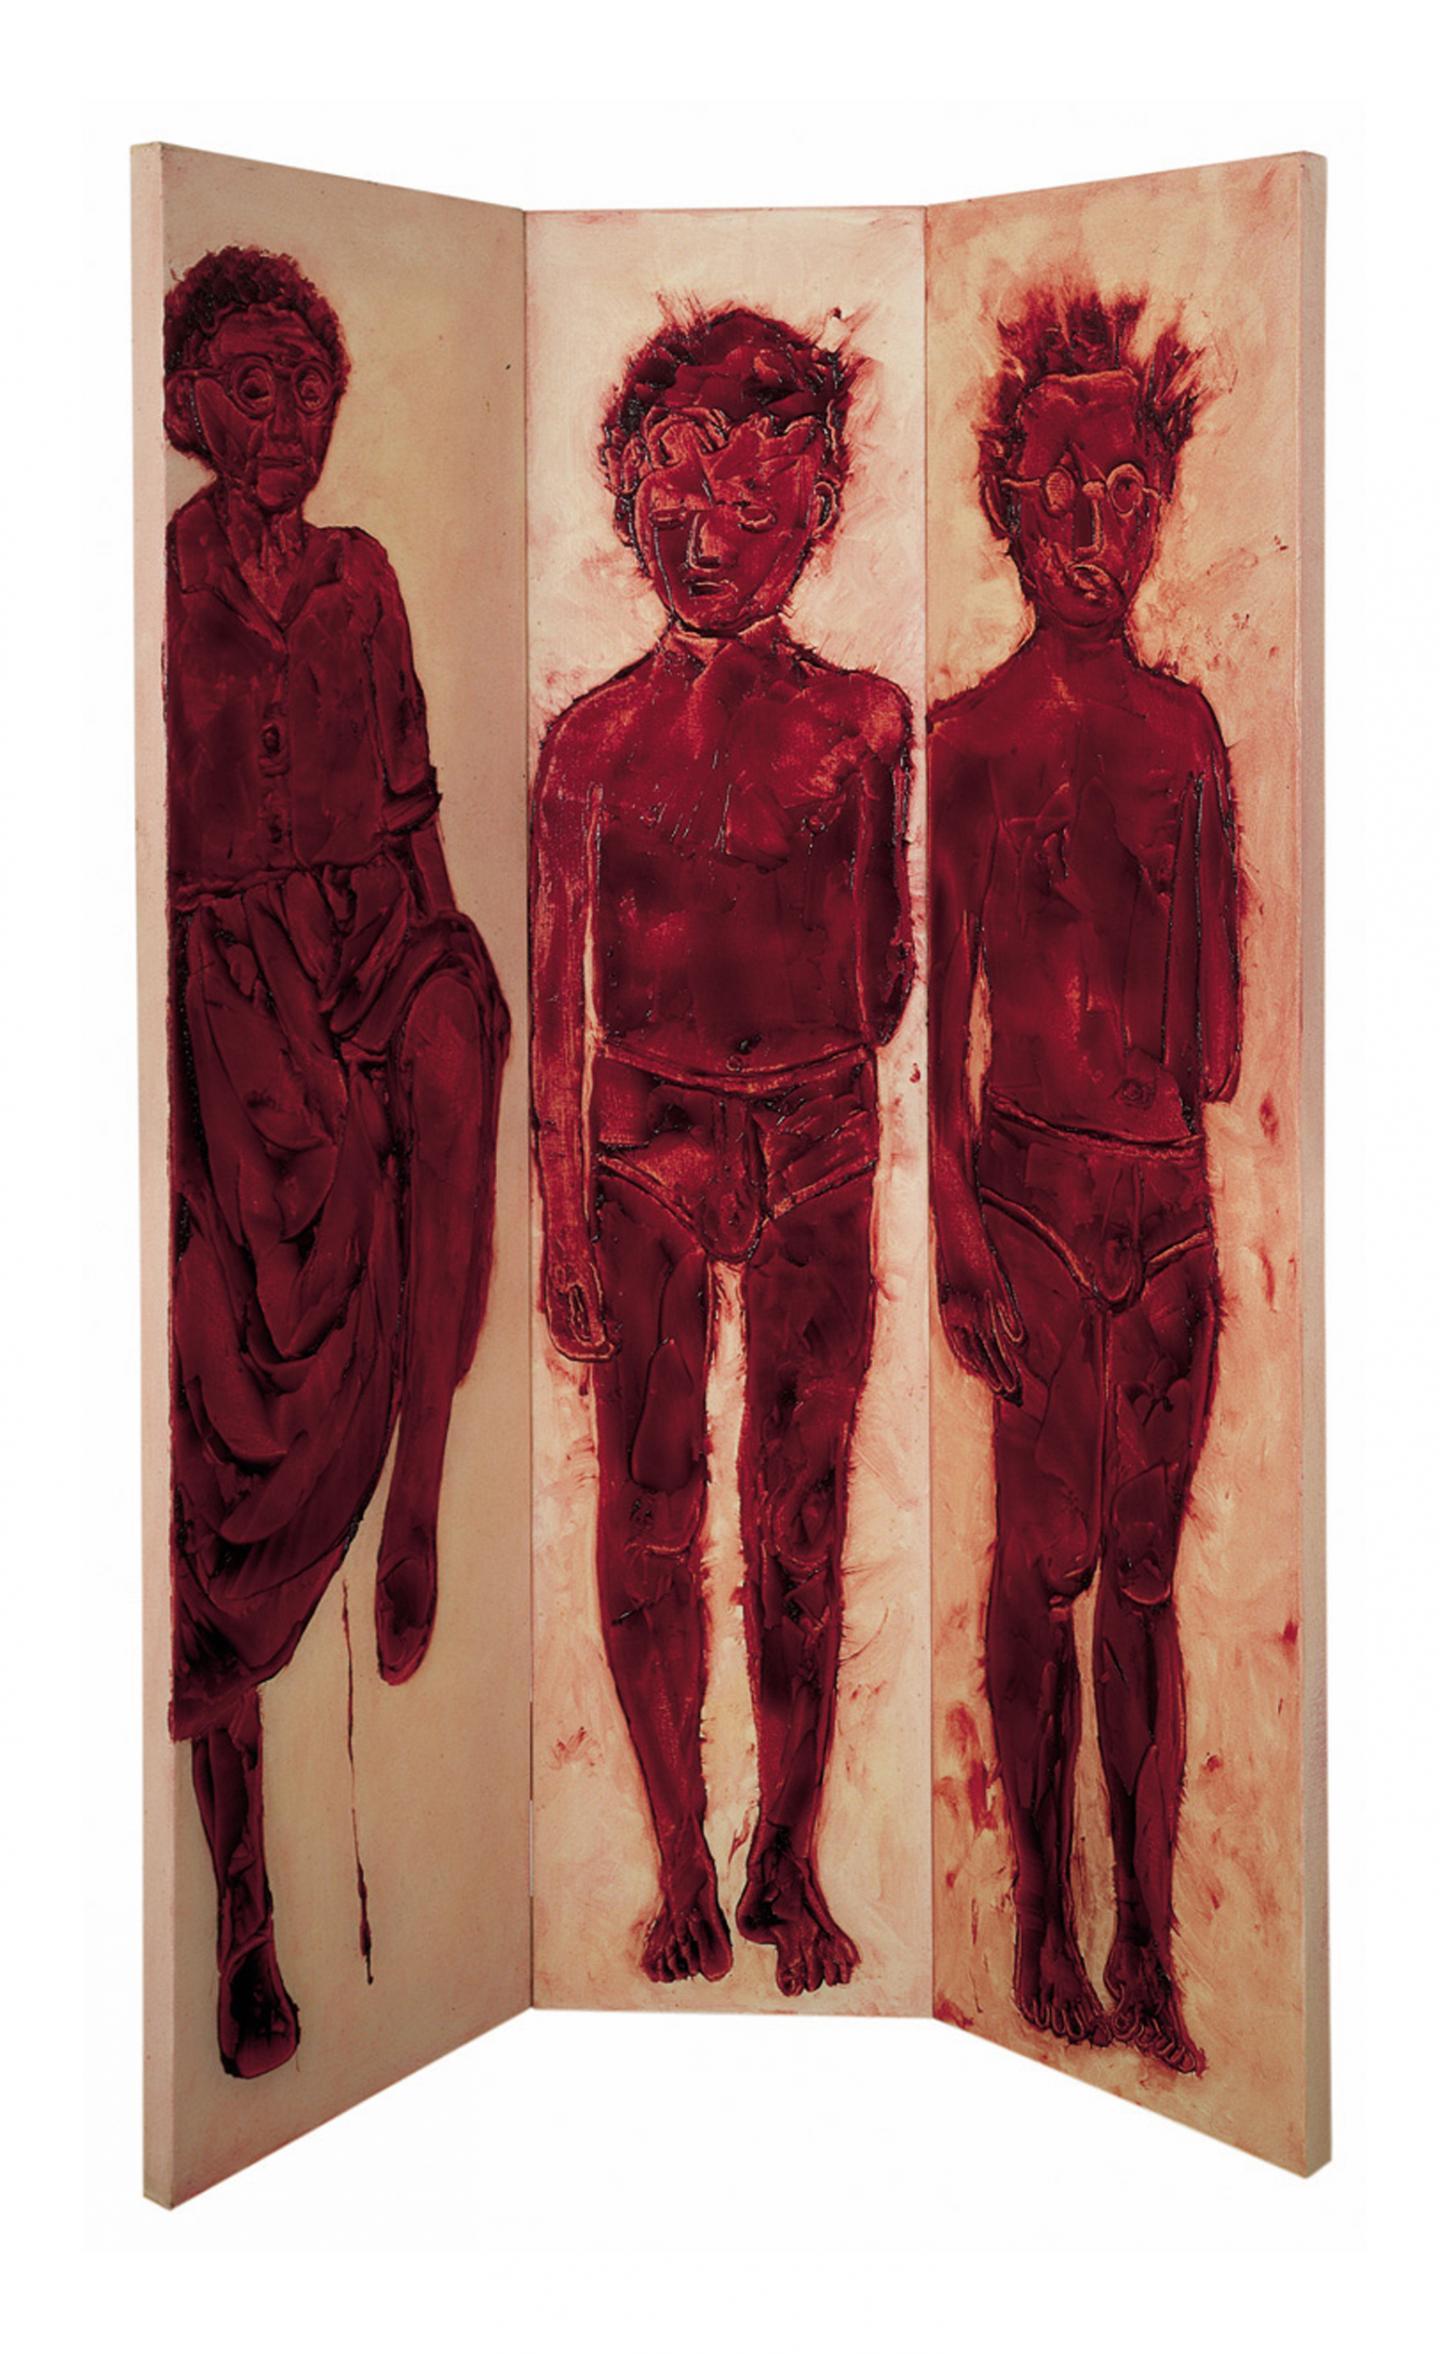 Ida Applebroog, Marginalia (trio), 1995, oil and resin gel on canvas, 3 panels, installation size variable. Courtesy: © Ida Applebroog and Hauser & Wirth; photograph: Emily Poole